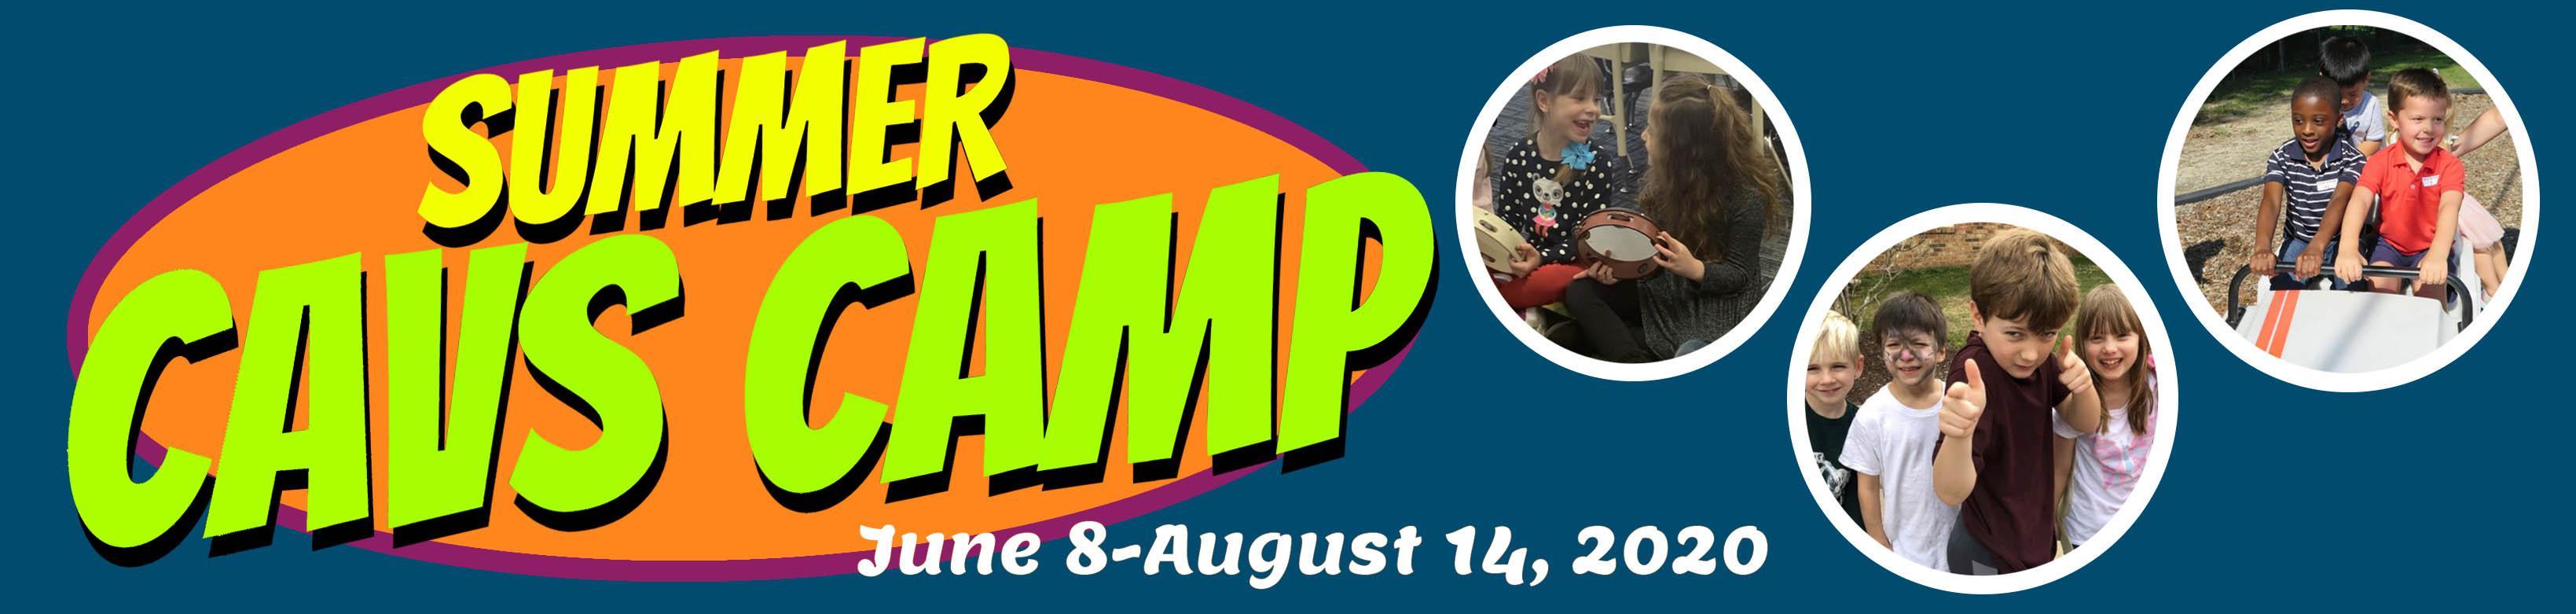 Summer Cavs Camp Banner